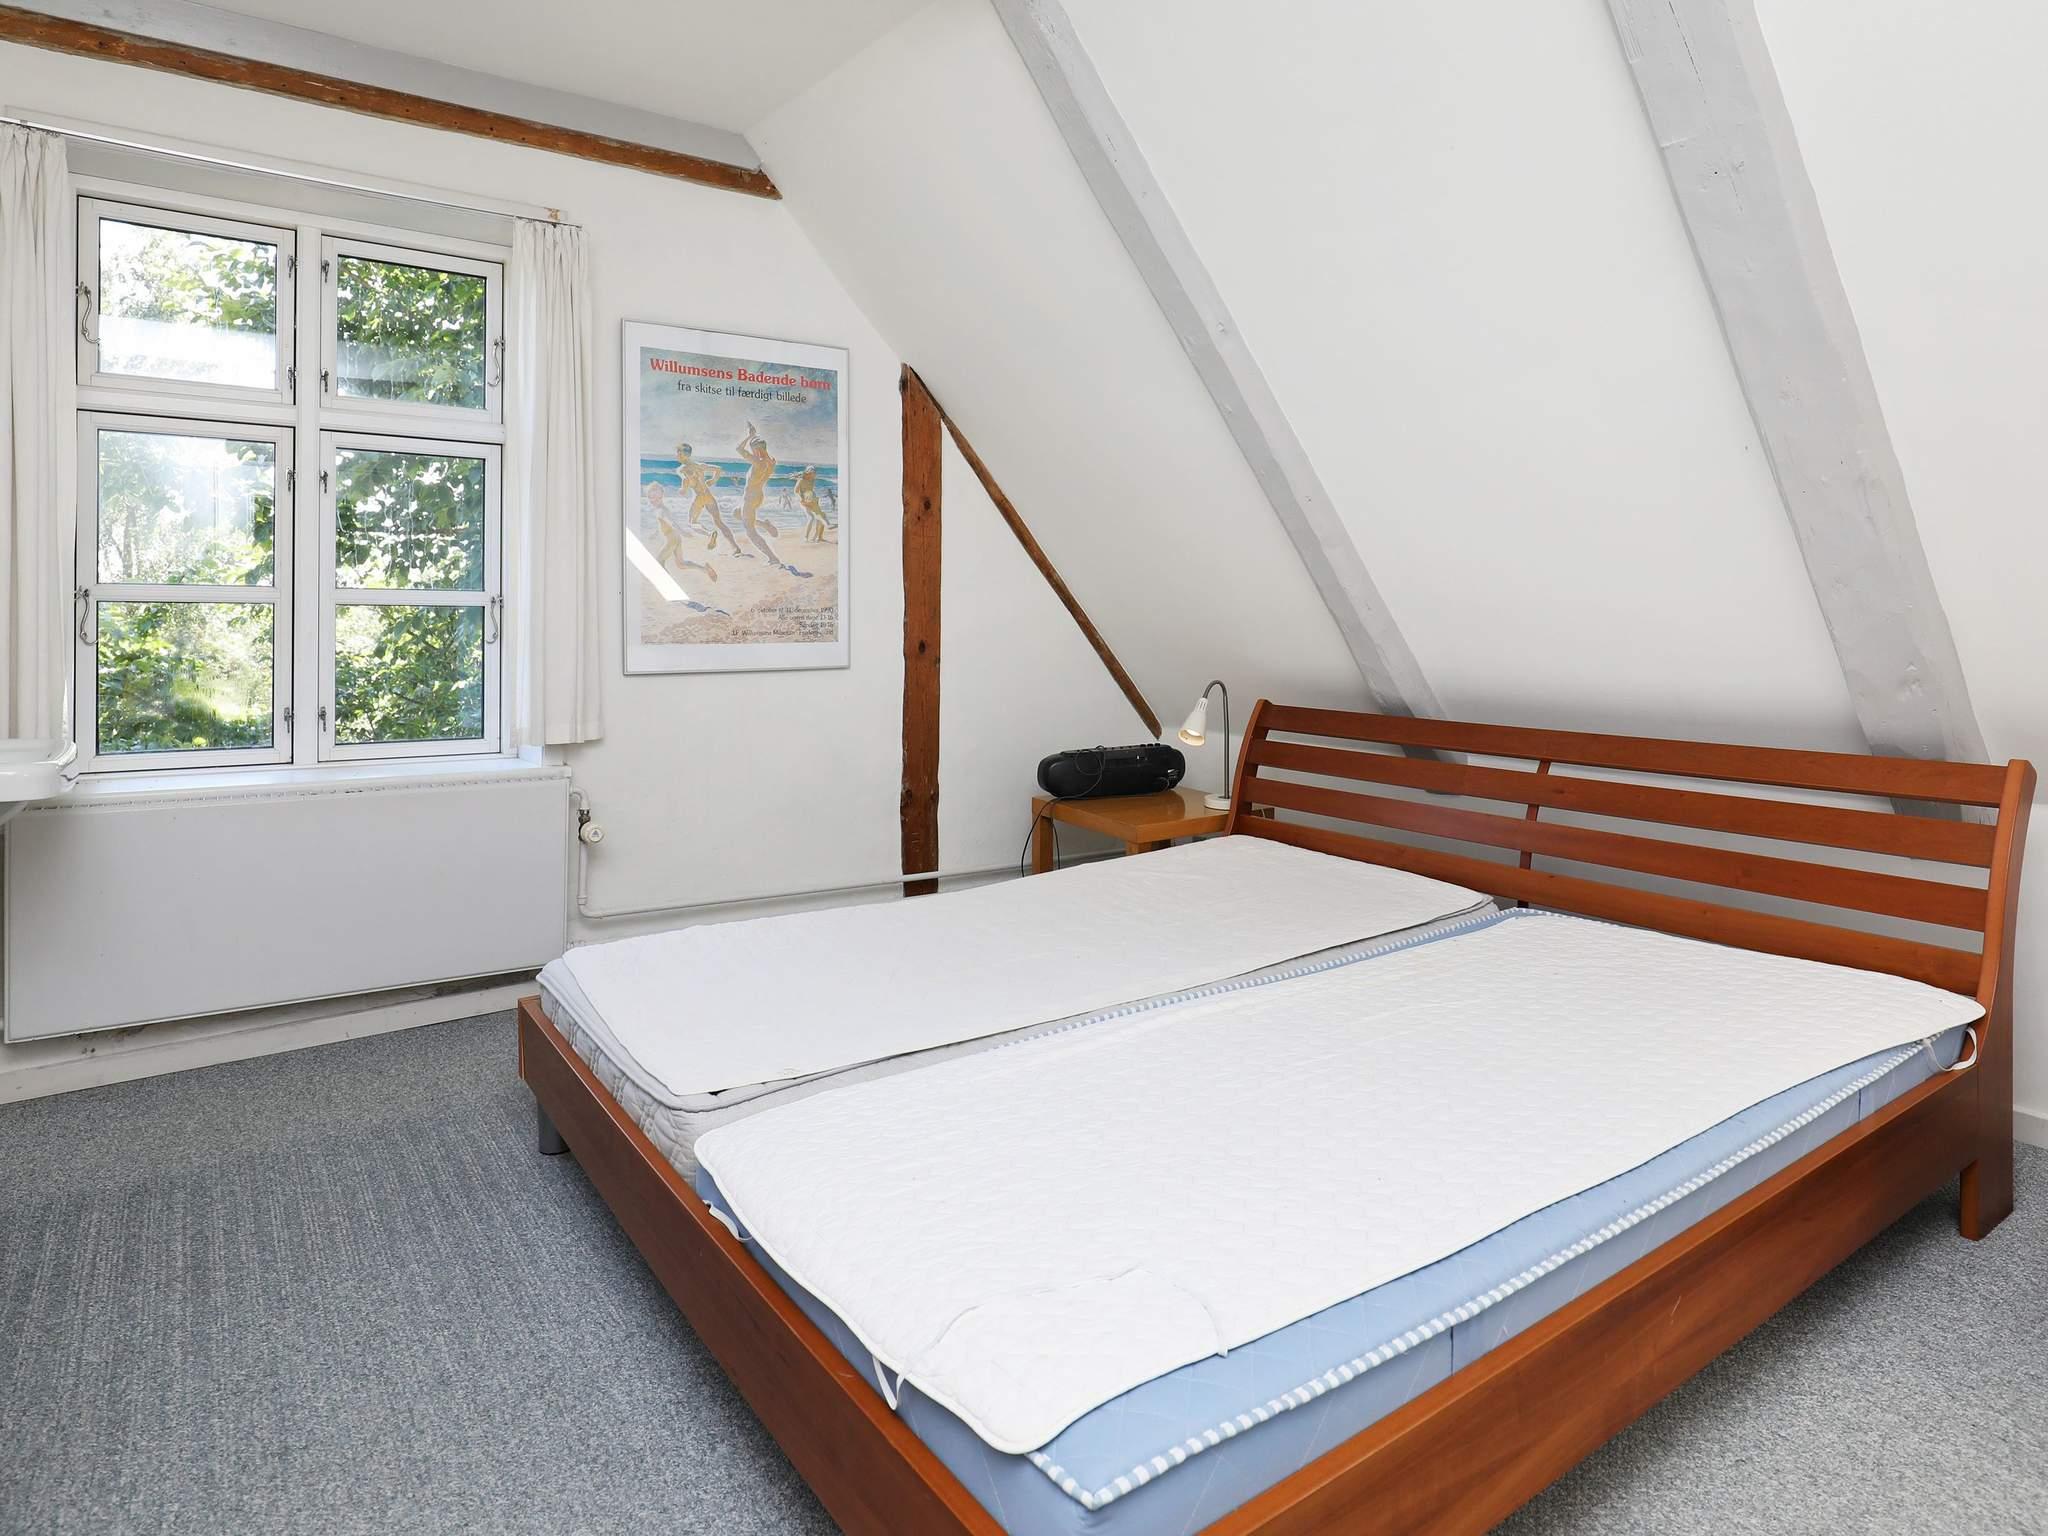 Ferienhaus Bukkemose (2453155), Humble, , Langeland, Dänemark, Bild 15